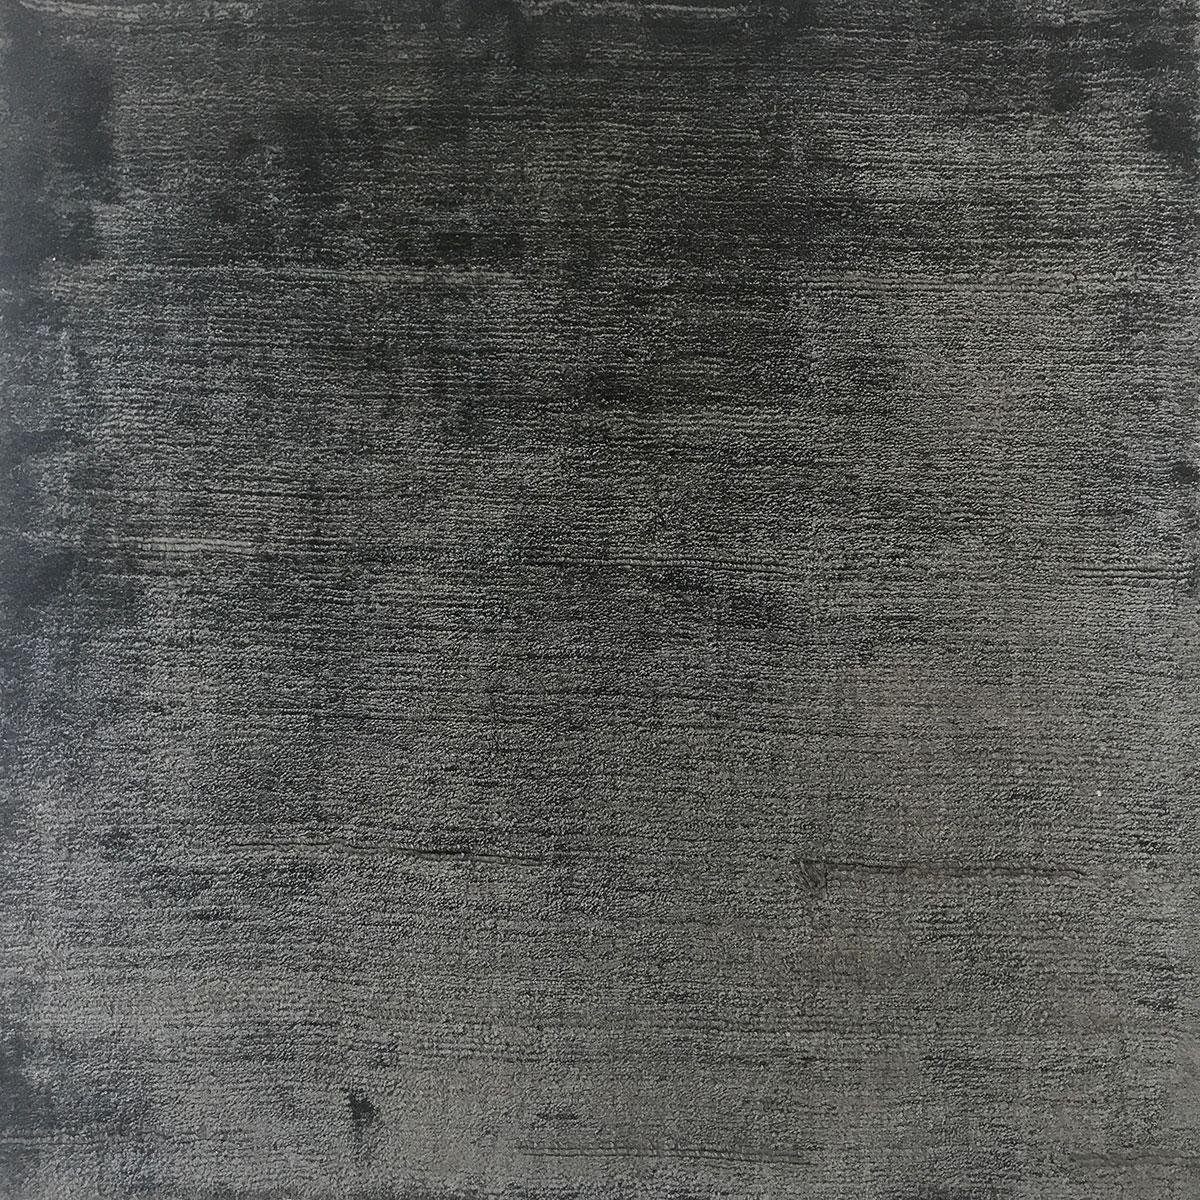 modal-dashes-black-custom-area-rug_thumb.jpg